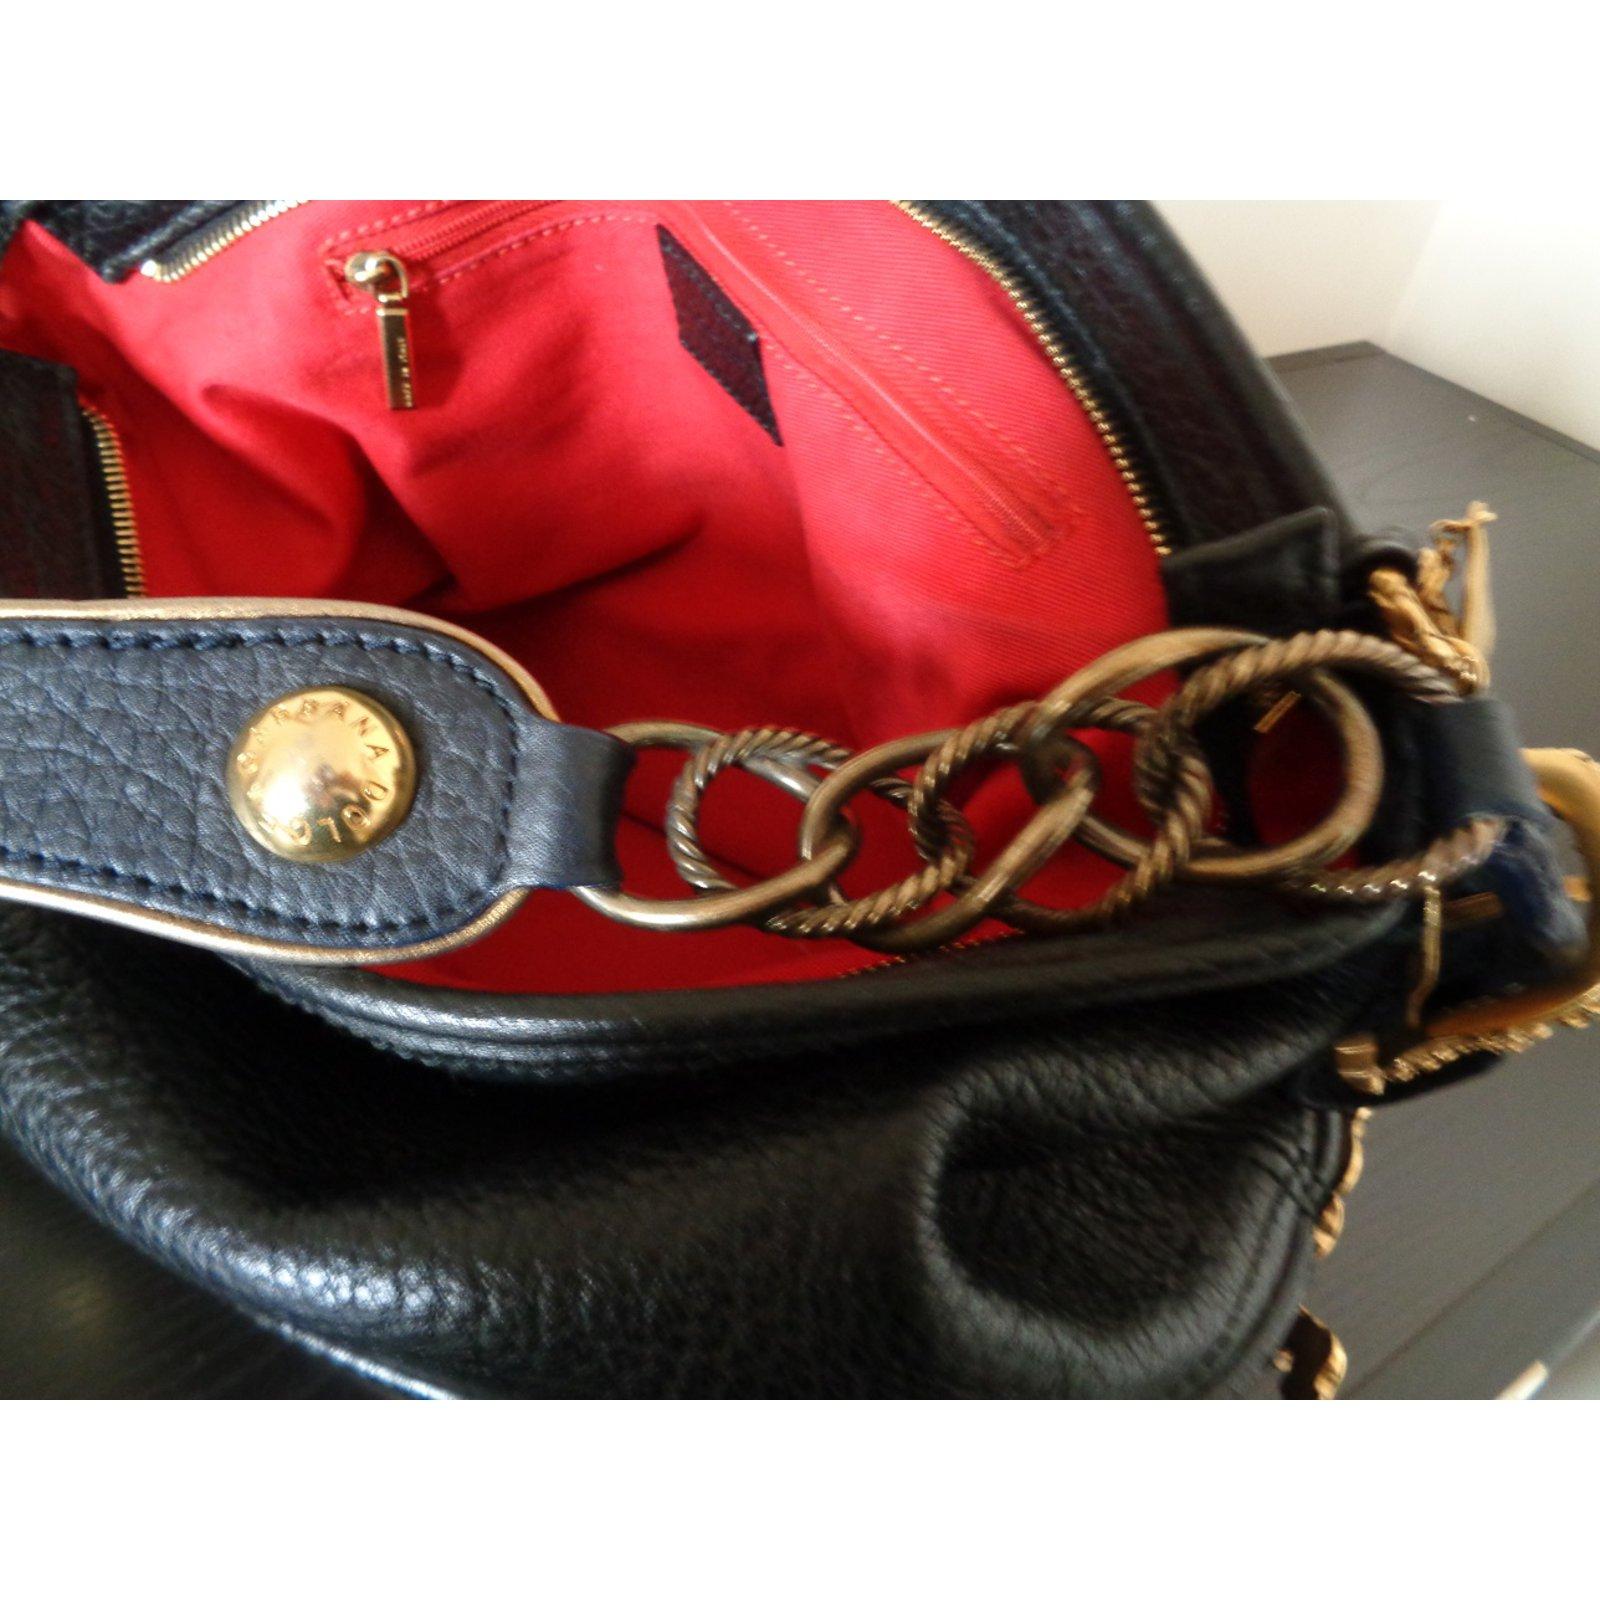 Facebook · Pin This. Dolce   Gabbana Handbags Handbags Leather Black ref. 108301 3bdad33bccae5